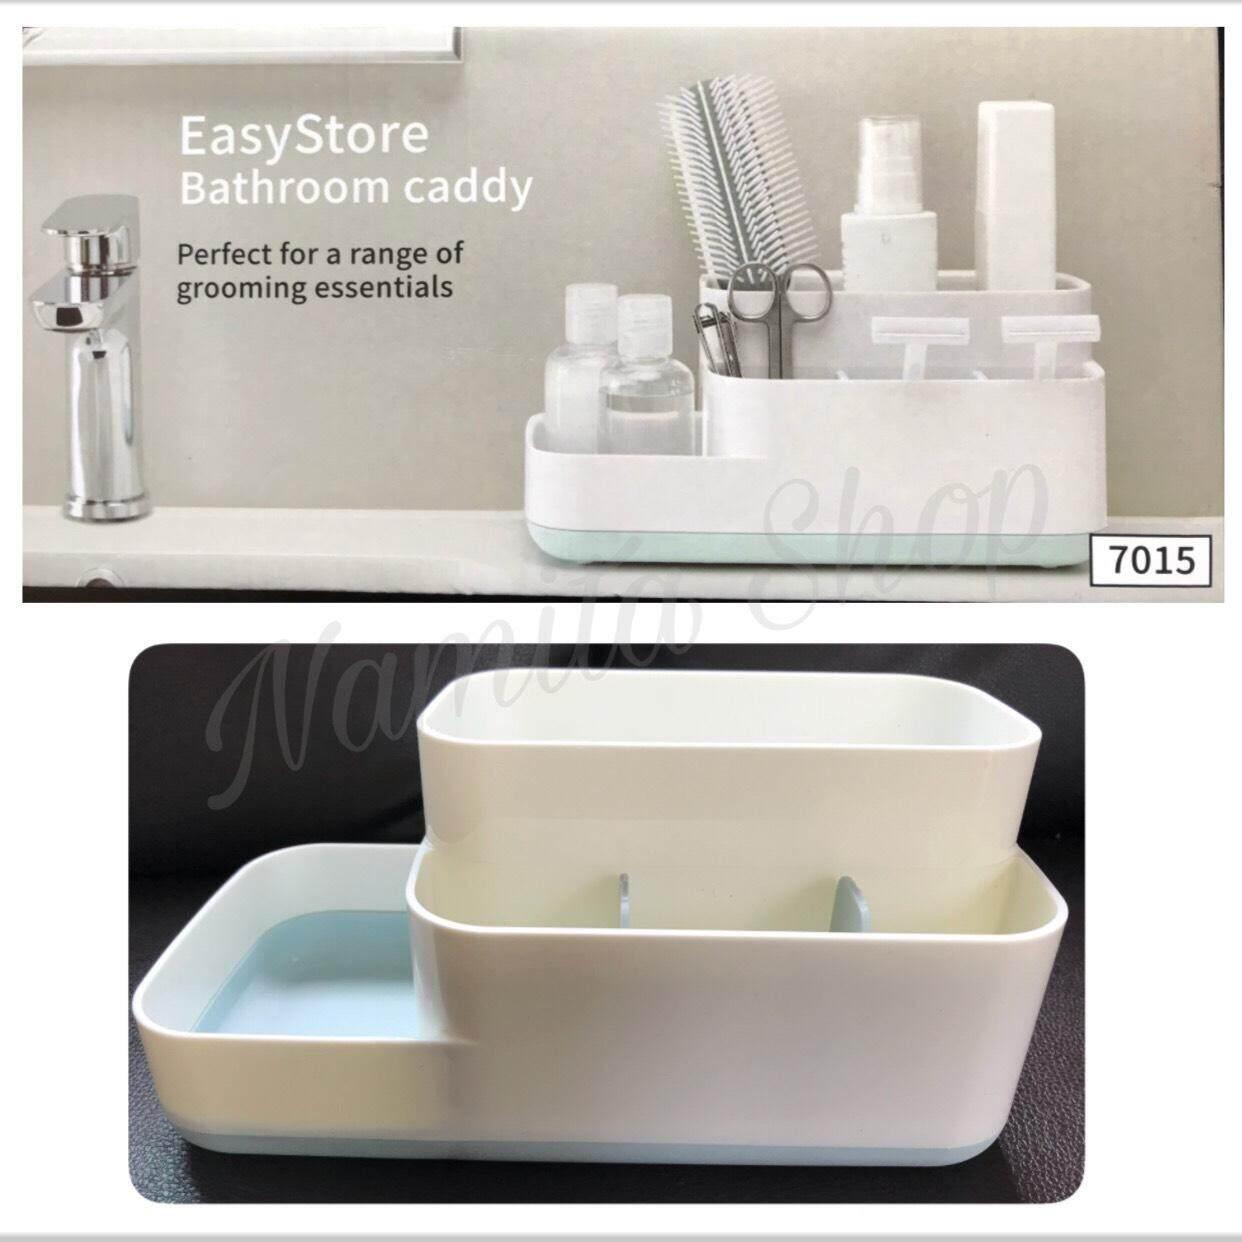 Easystore Bathroom Caddy กล่องใส่ของในห้องน้ำ กล่องใส่ของอเนกประสงค์ เก็บของในห้องน้ำ จัดระเบียบสิ่งของ.